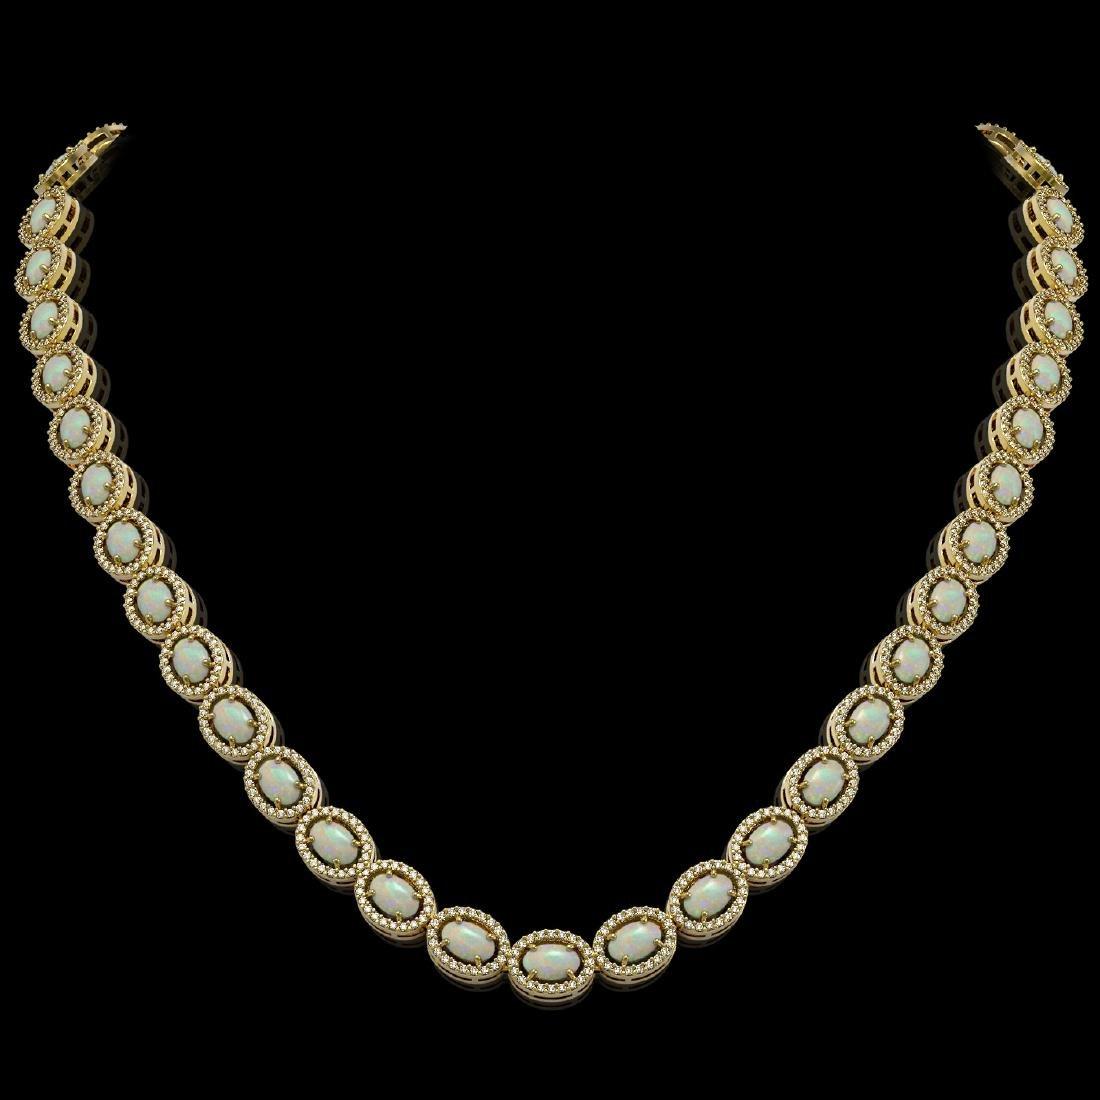 21.21 CTW Opal & Diamond Halo Necklace 10K Yellow Gold